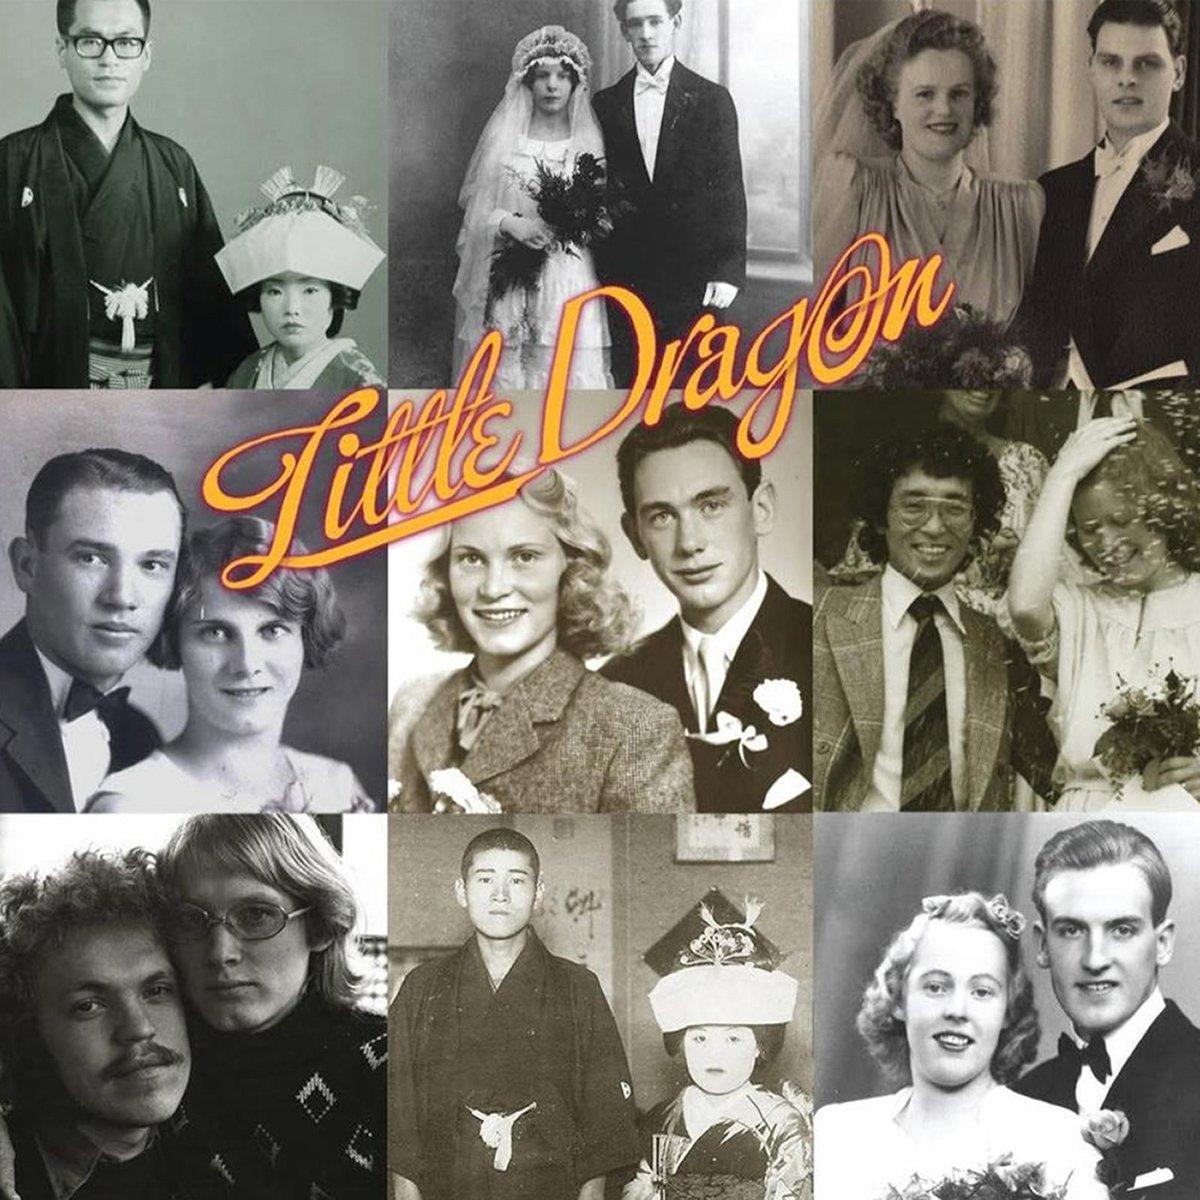 Little Dragon, Ritual Union